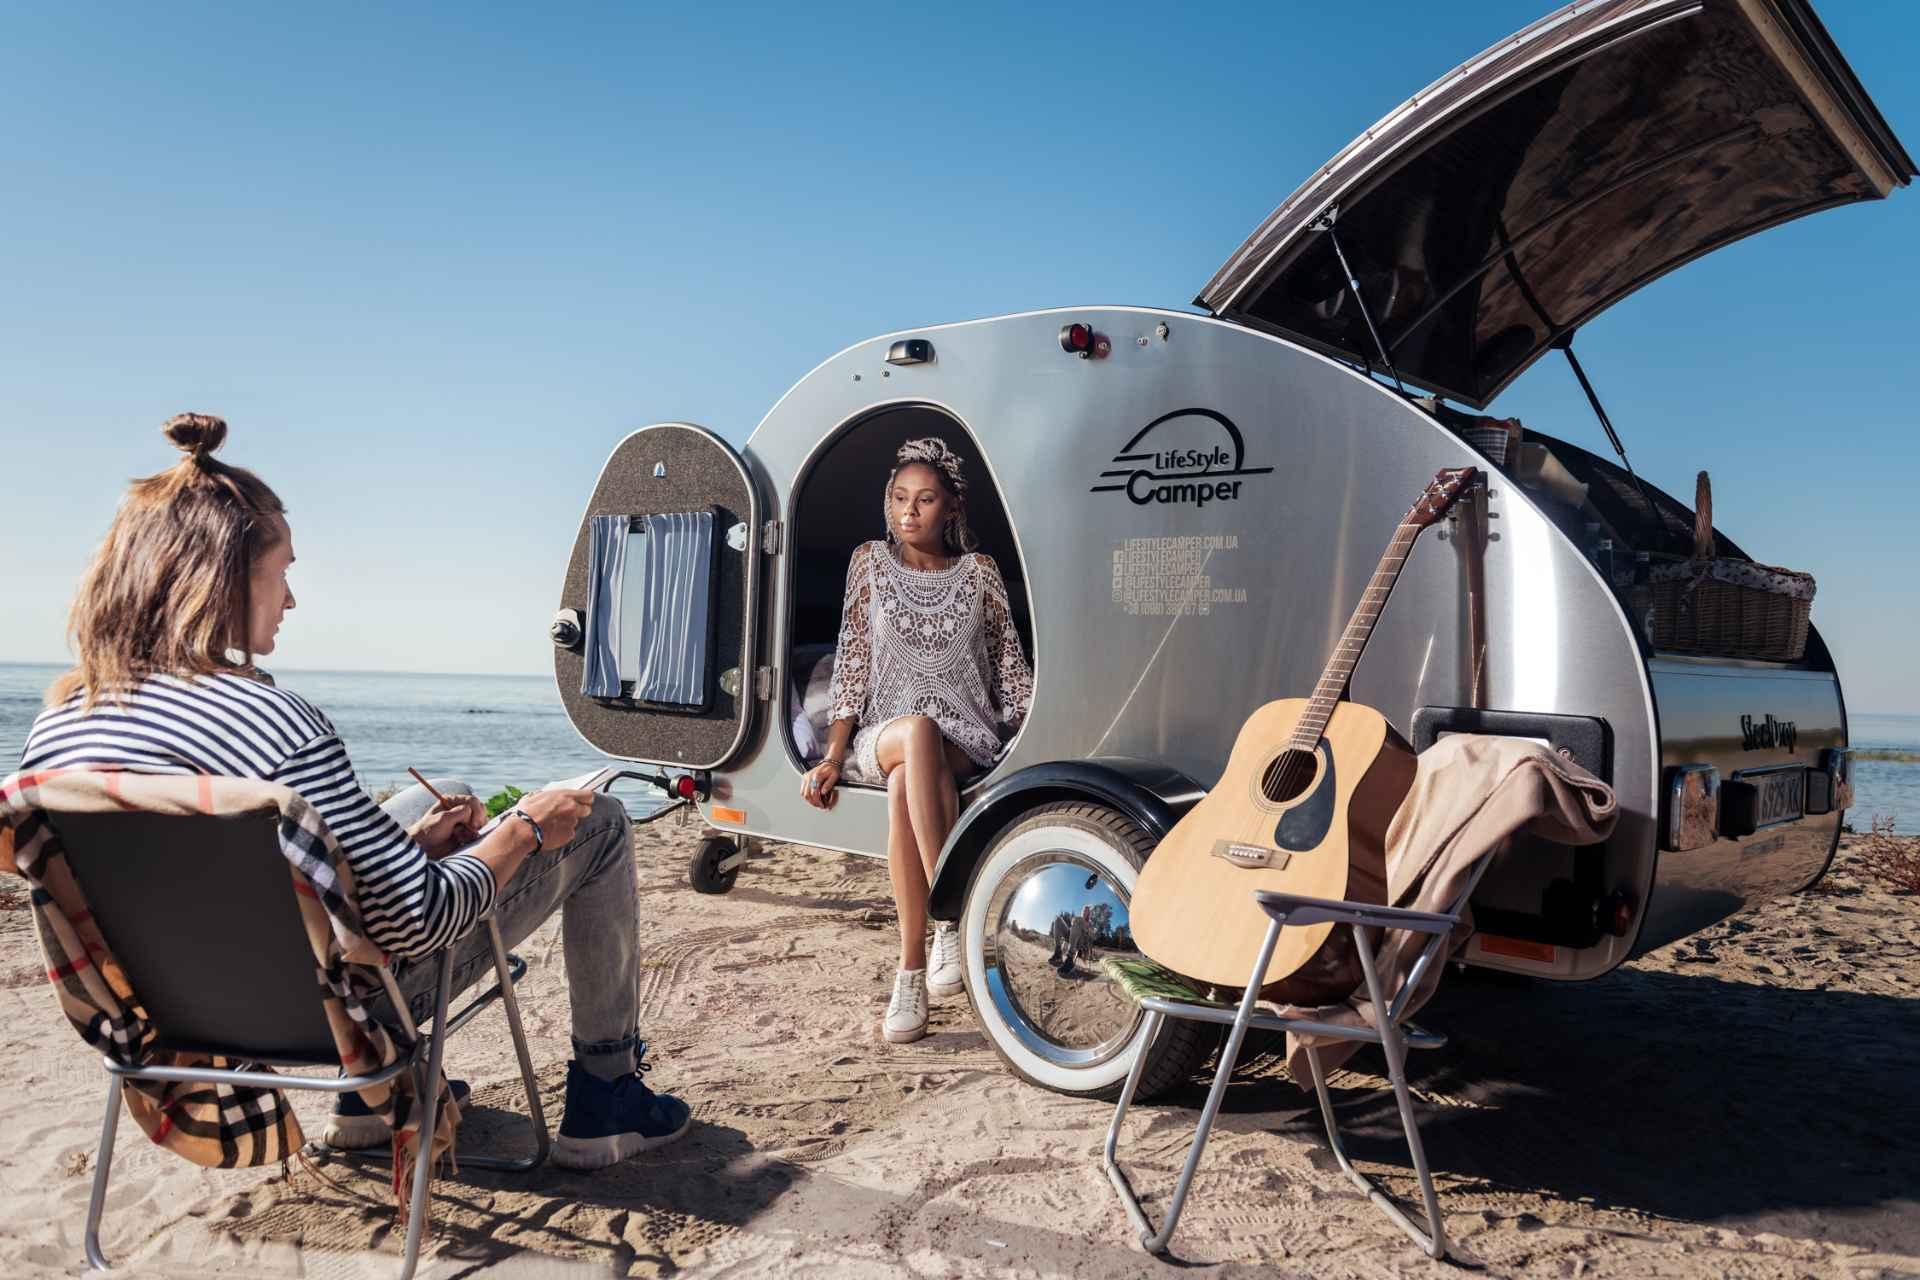 lifestyle camper norge steeldrop teardrop campingvogn produktfoto 9